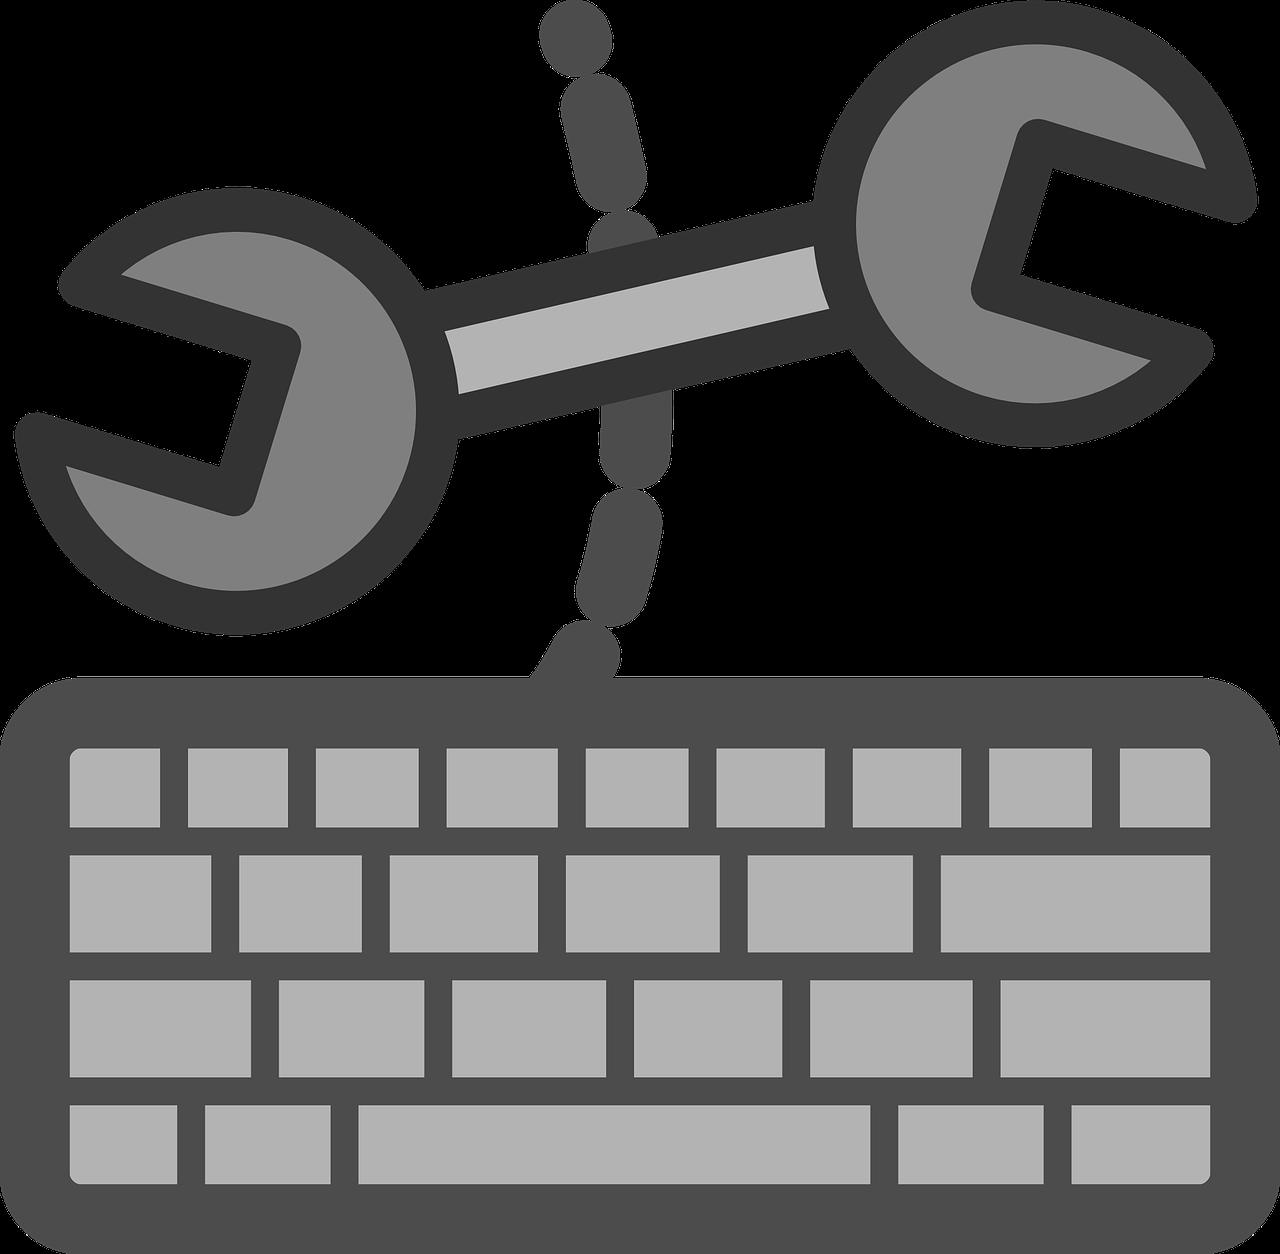 Keyboard clipart item. Configuration management in drupal